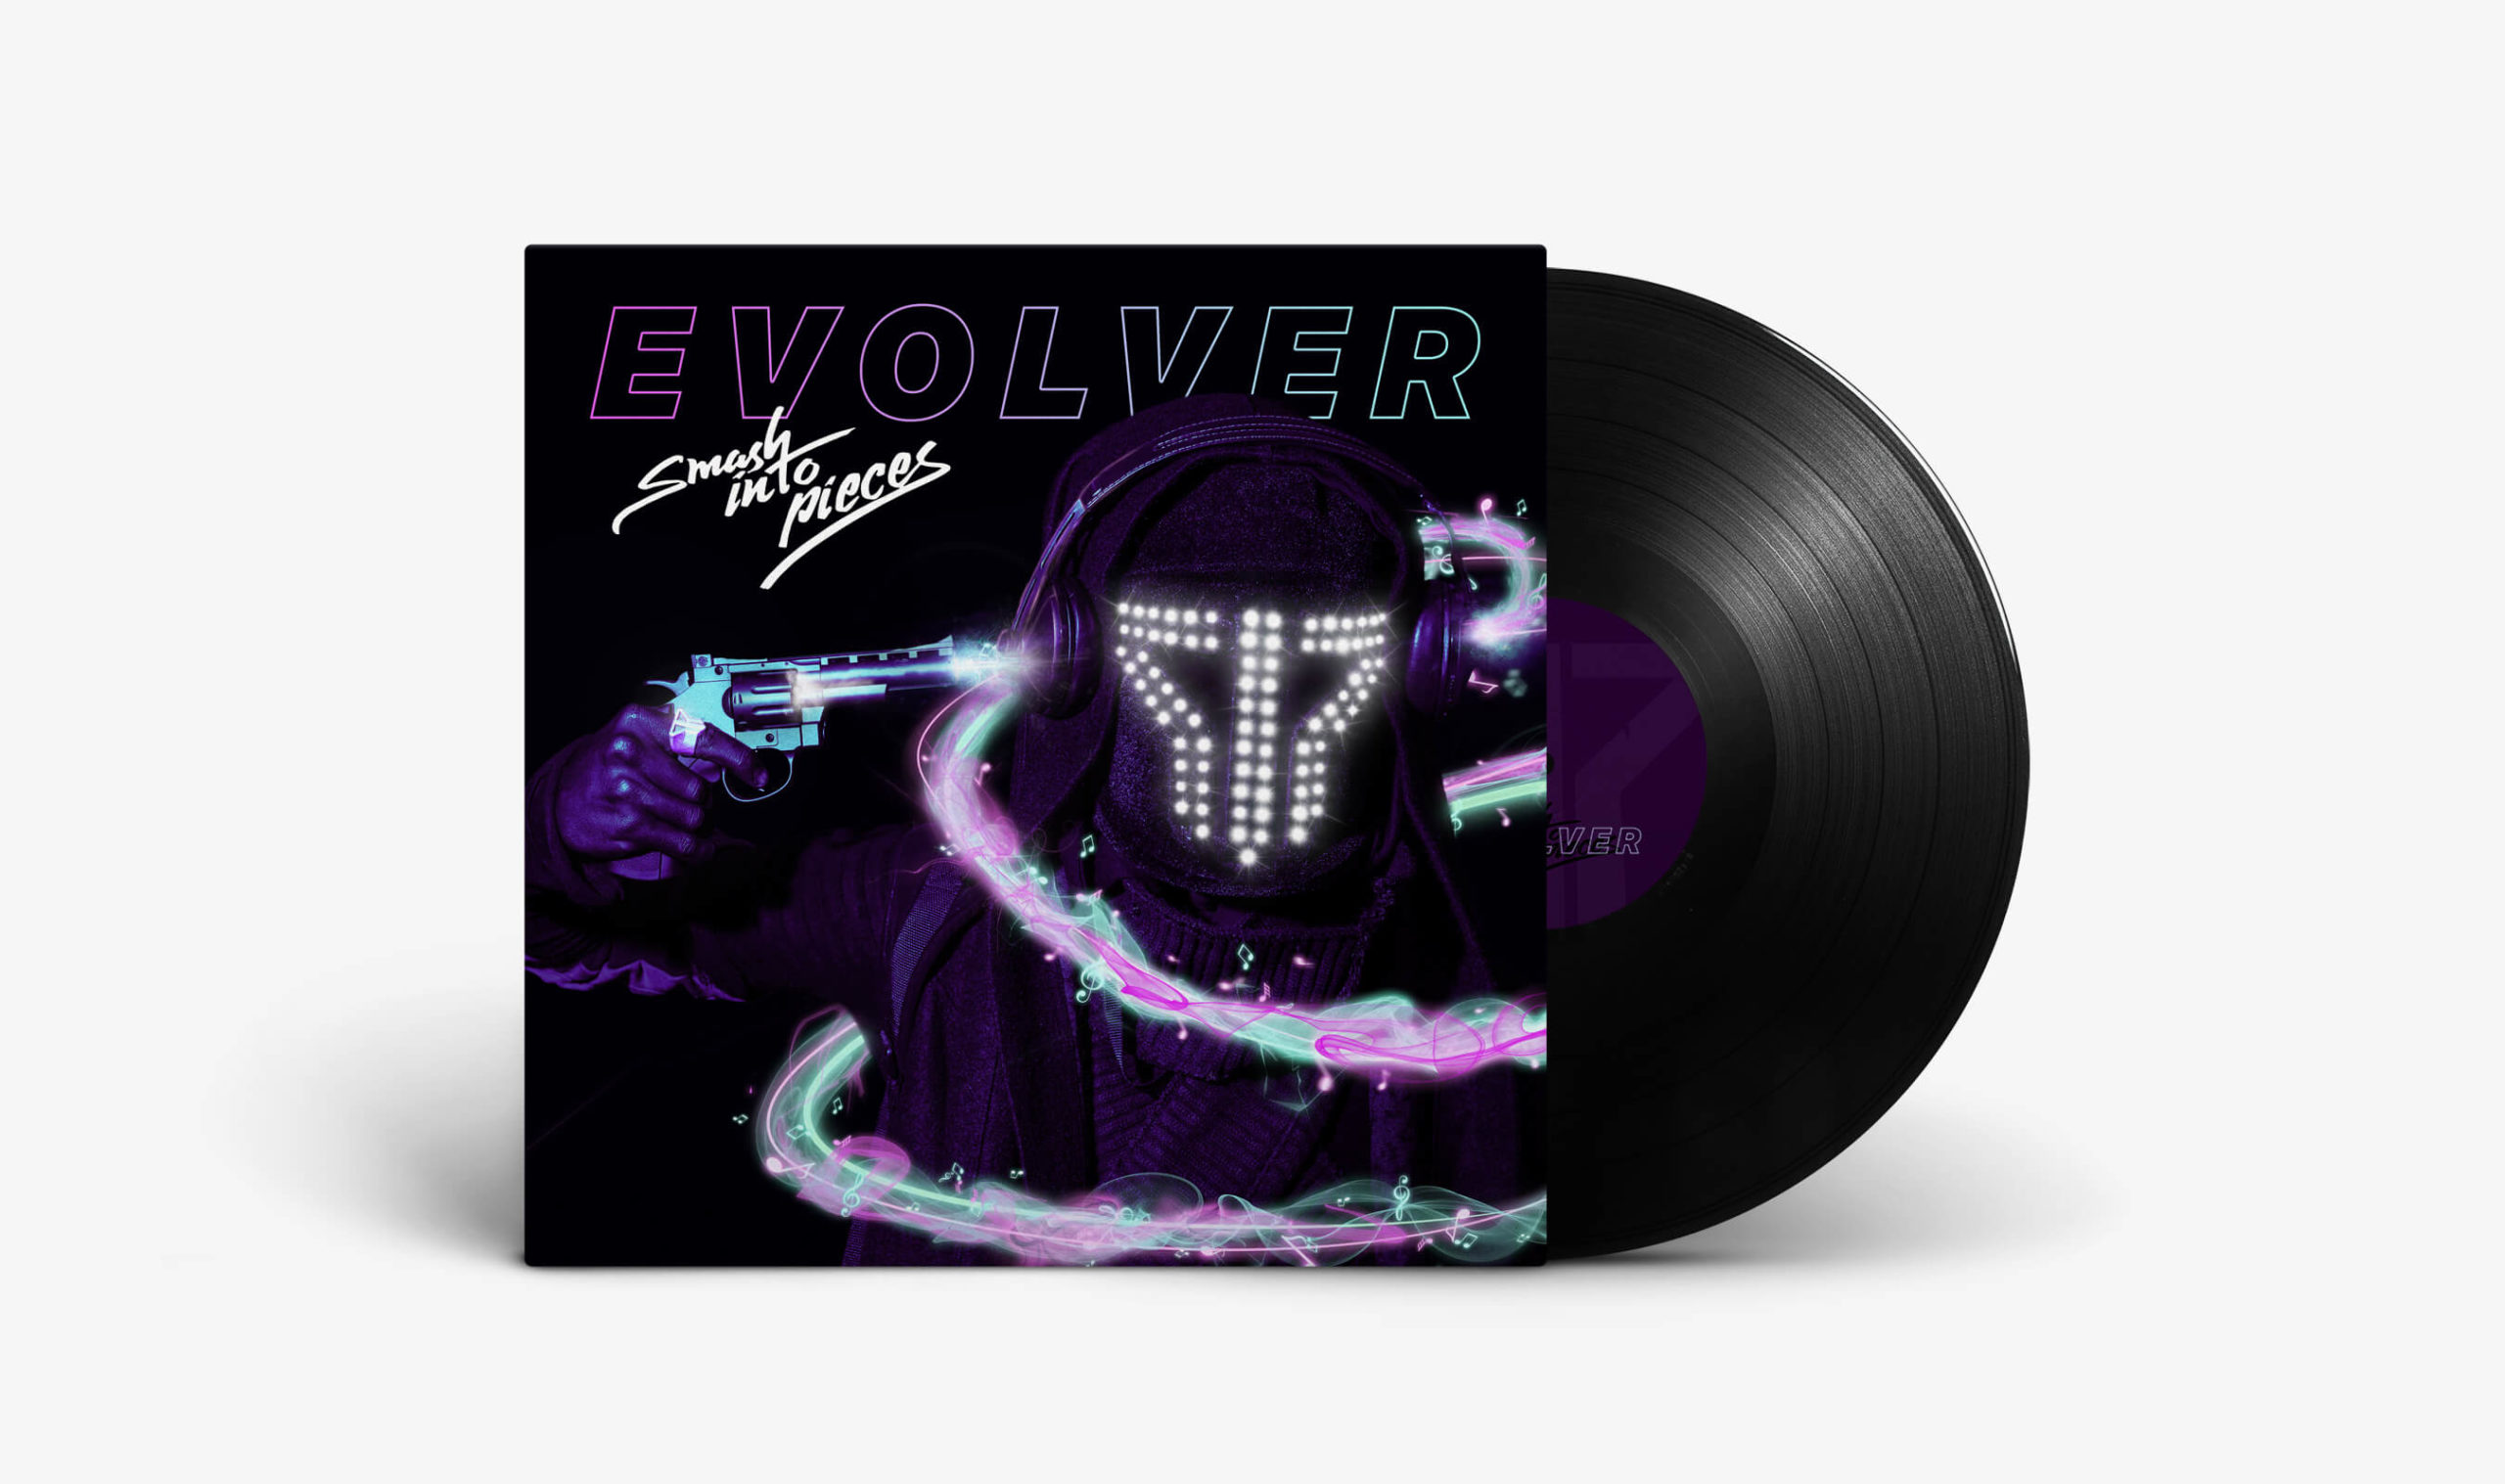 Smash Into Pieces - Evolver Vinyl Artwork